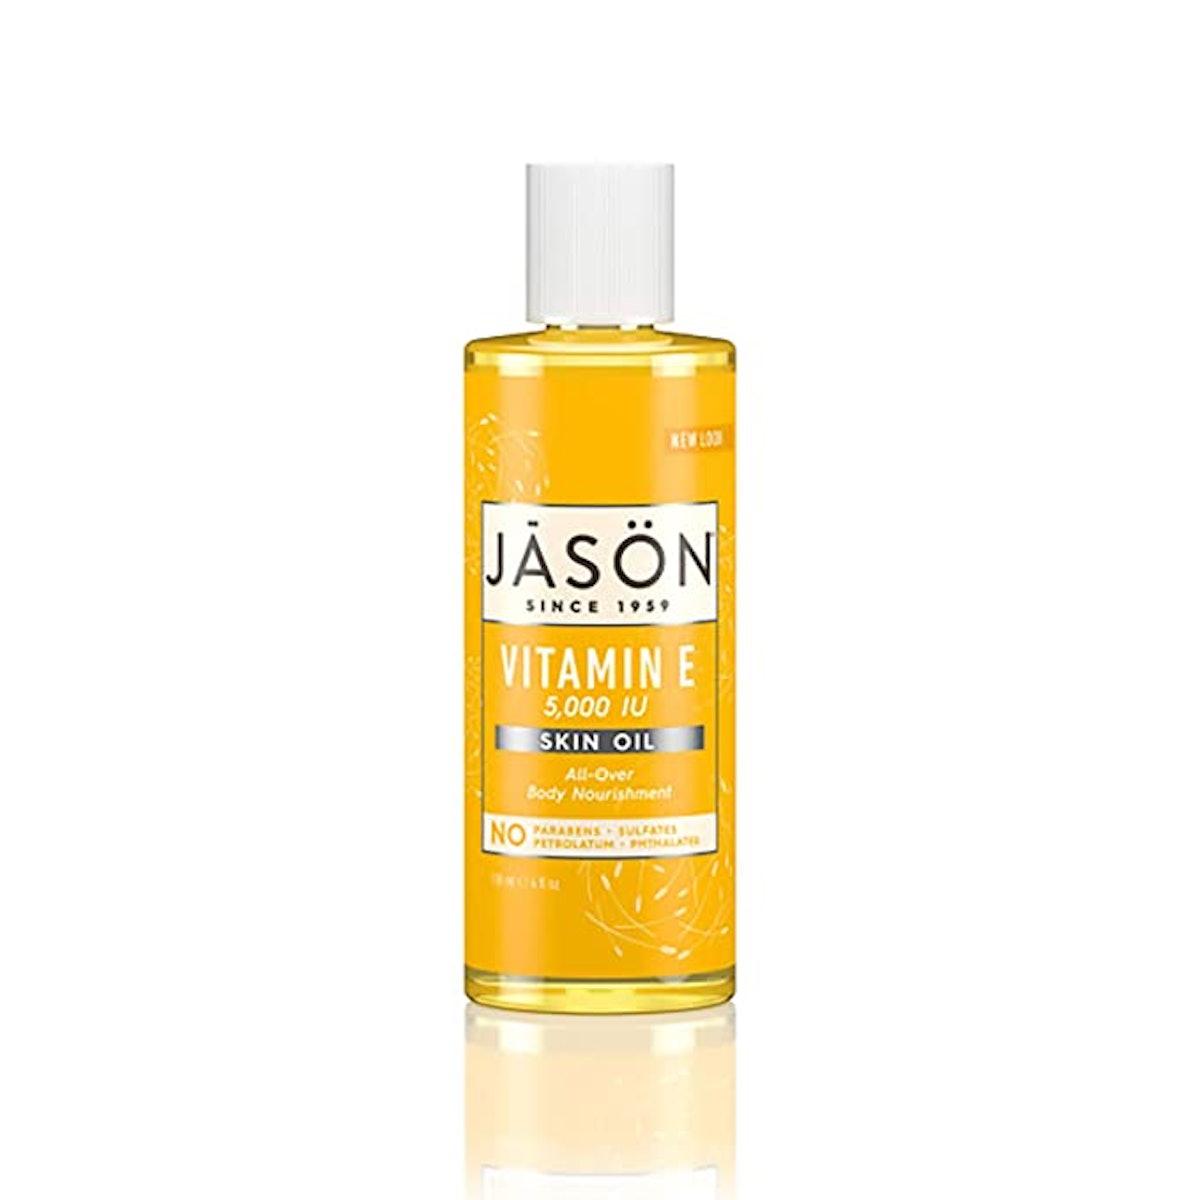 Jason Skin Oil